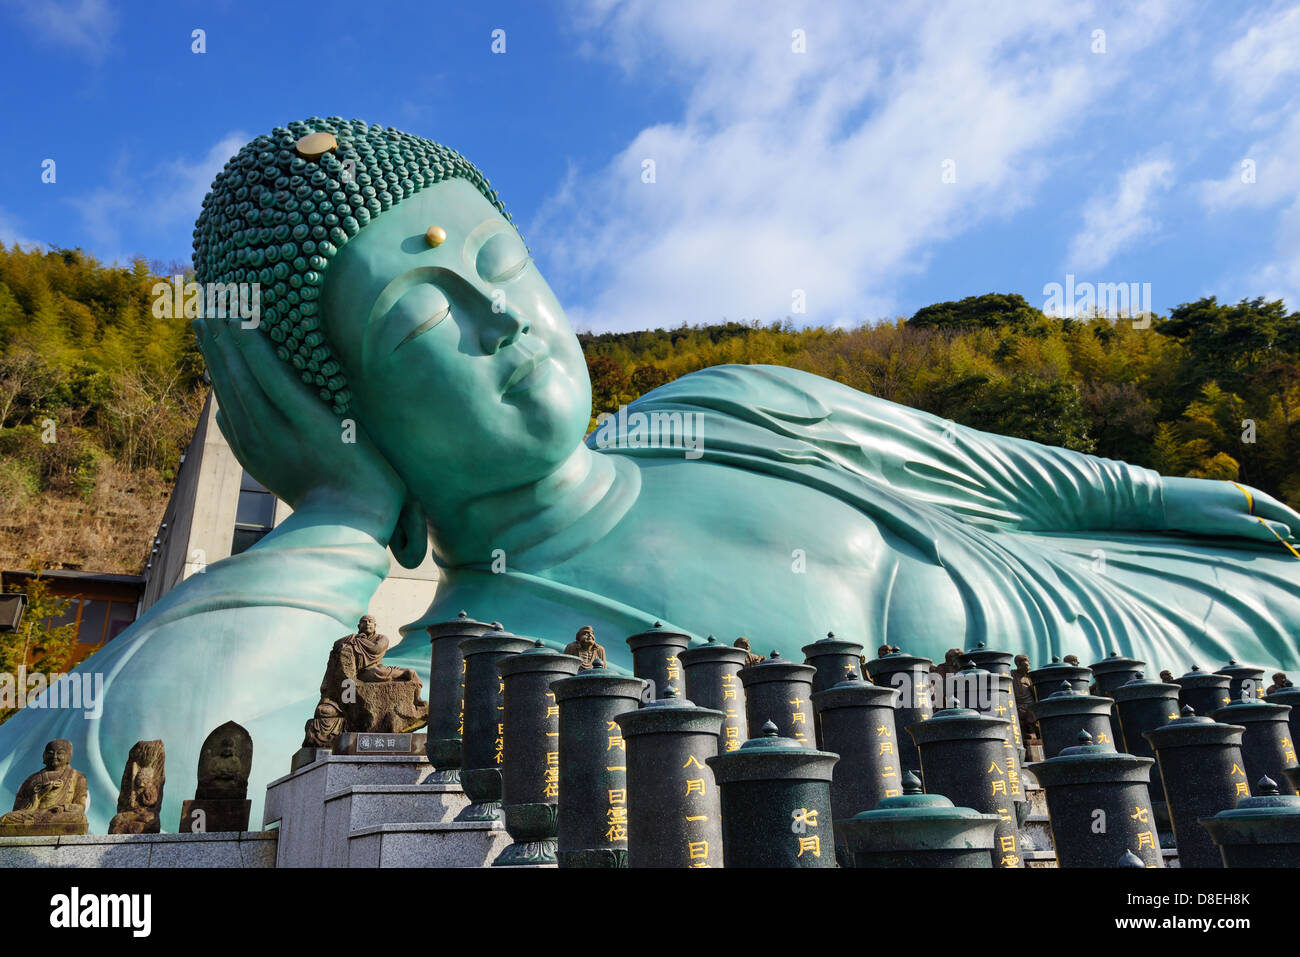 Reclining Buddha statue of Nanzoin Temple in Kyushu, Japan. - Stock Image